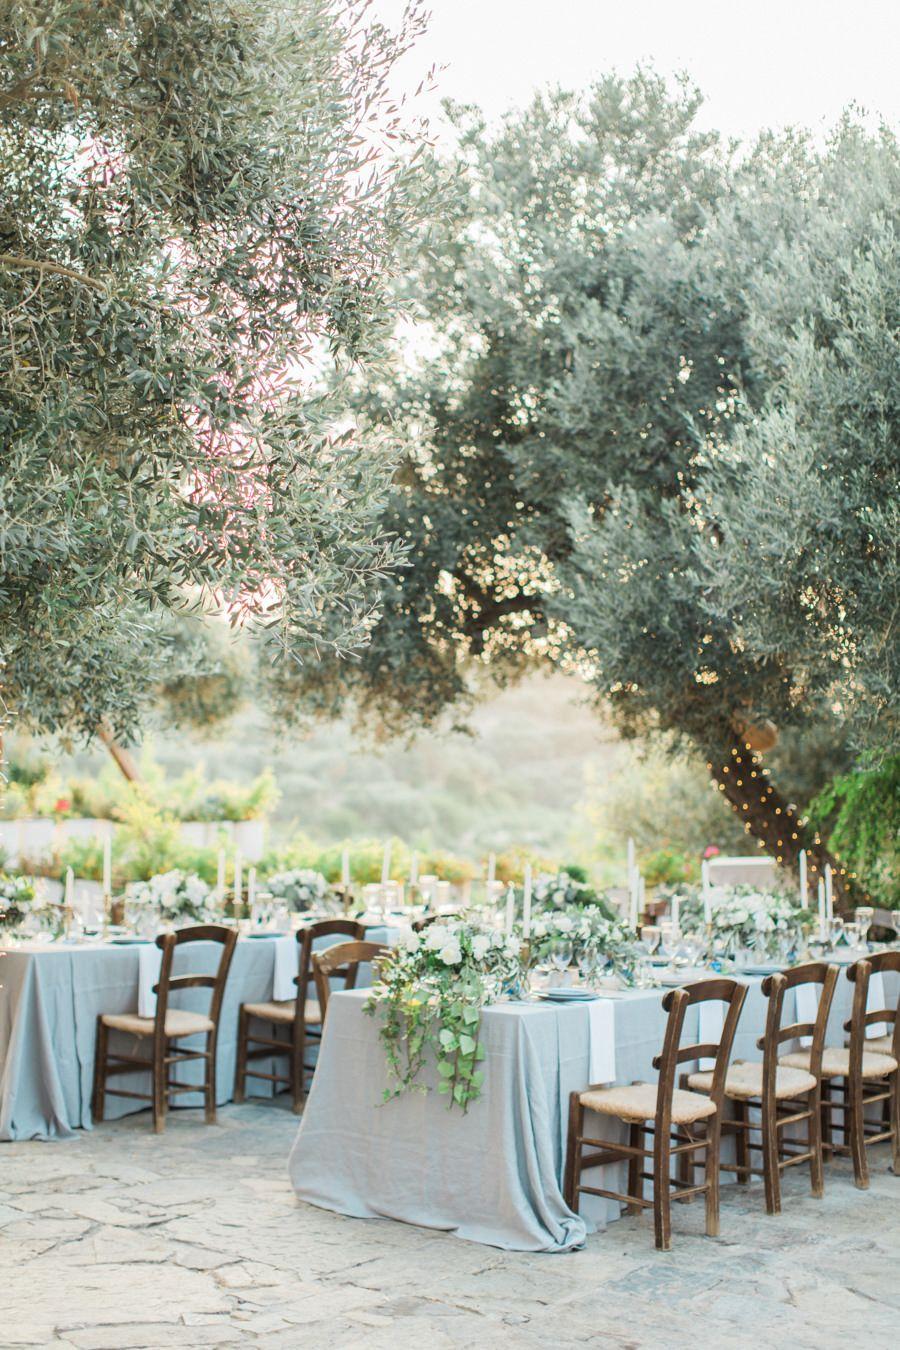 Over the top wedding decorations  Rustic Elegant Crete Destination Wedding  Greek wedding